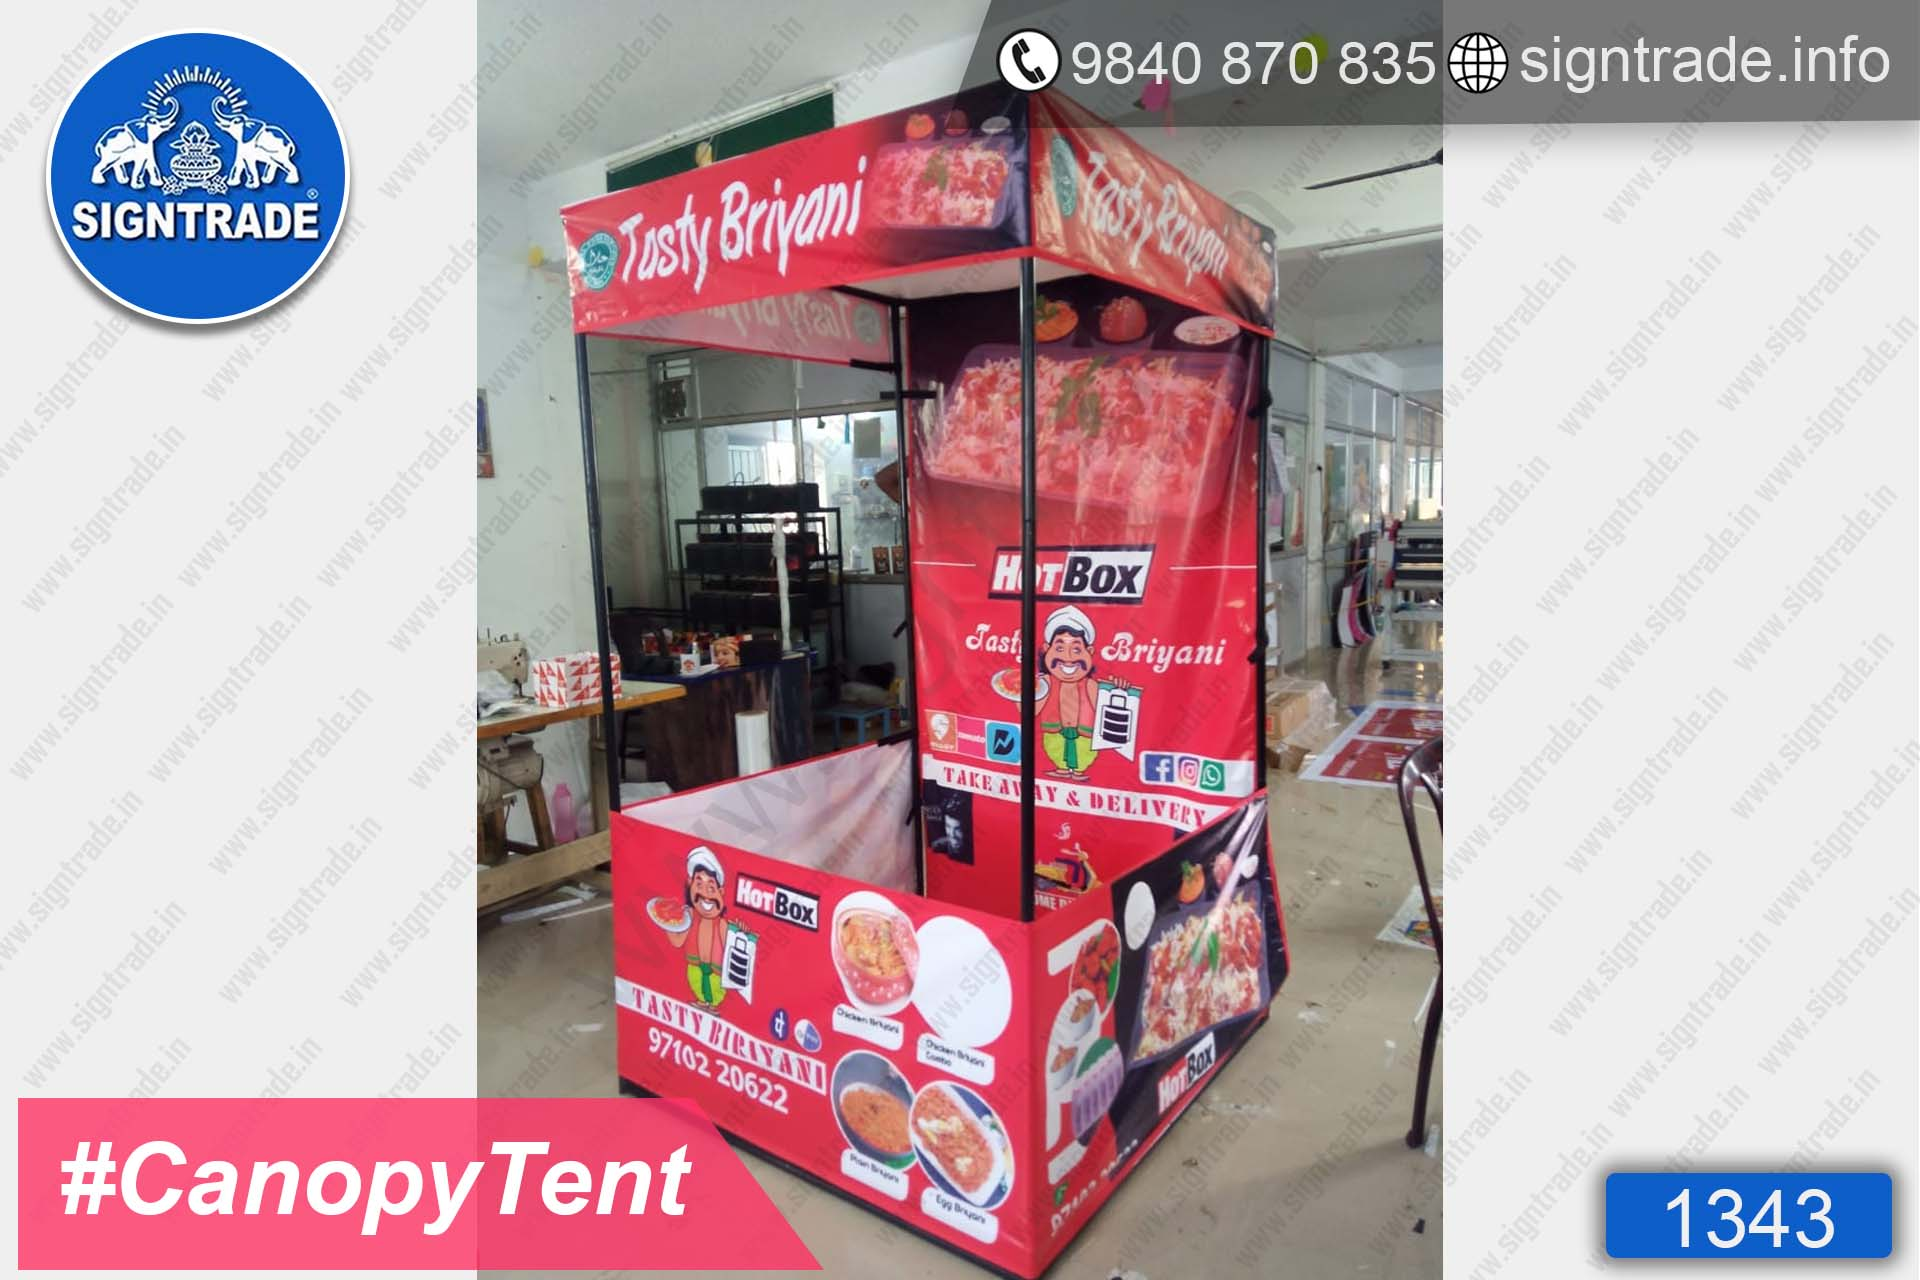 Tasty Briyani, Chennai - SIGNTRADE - Canopy Tent Manufactures in Chennai